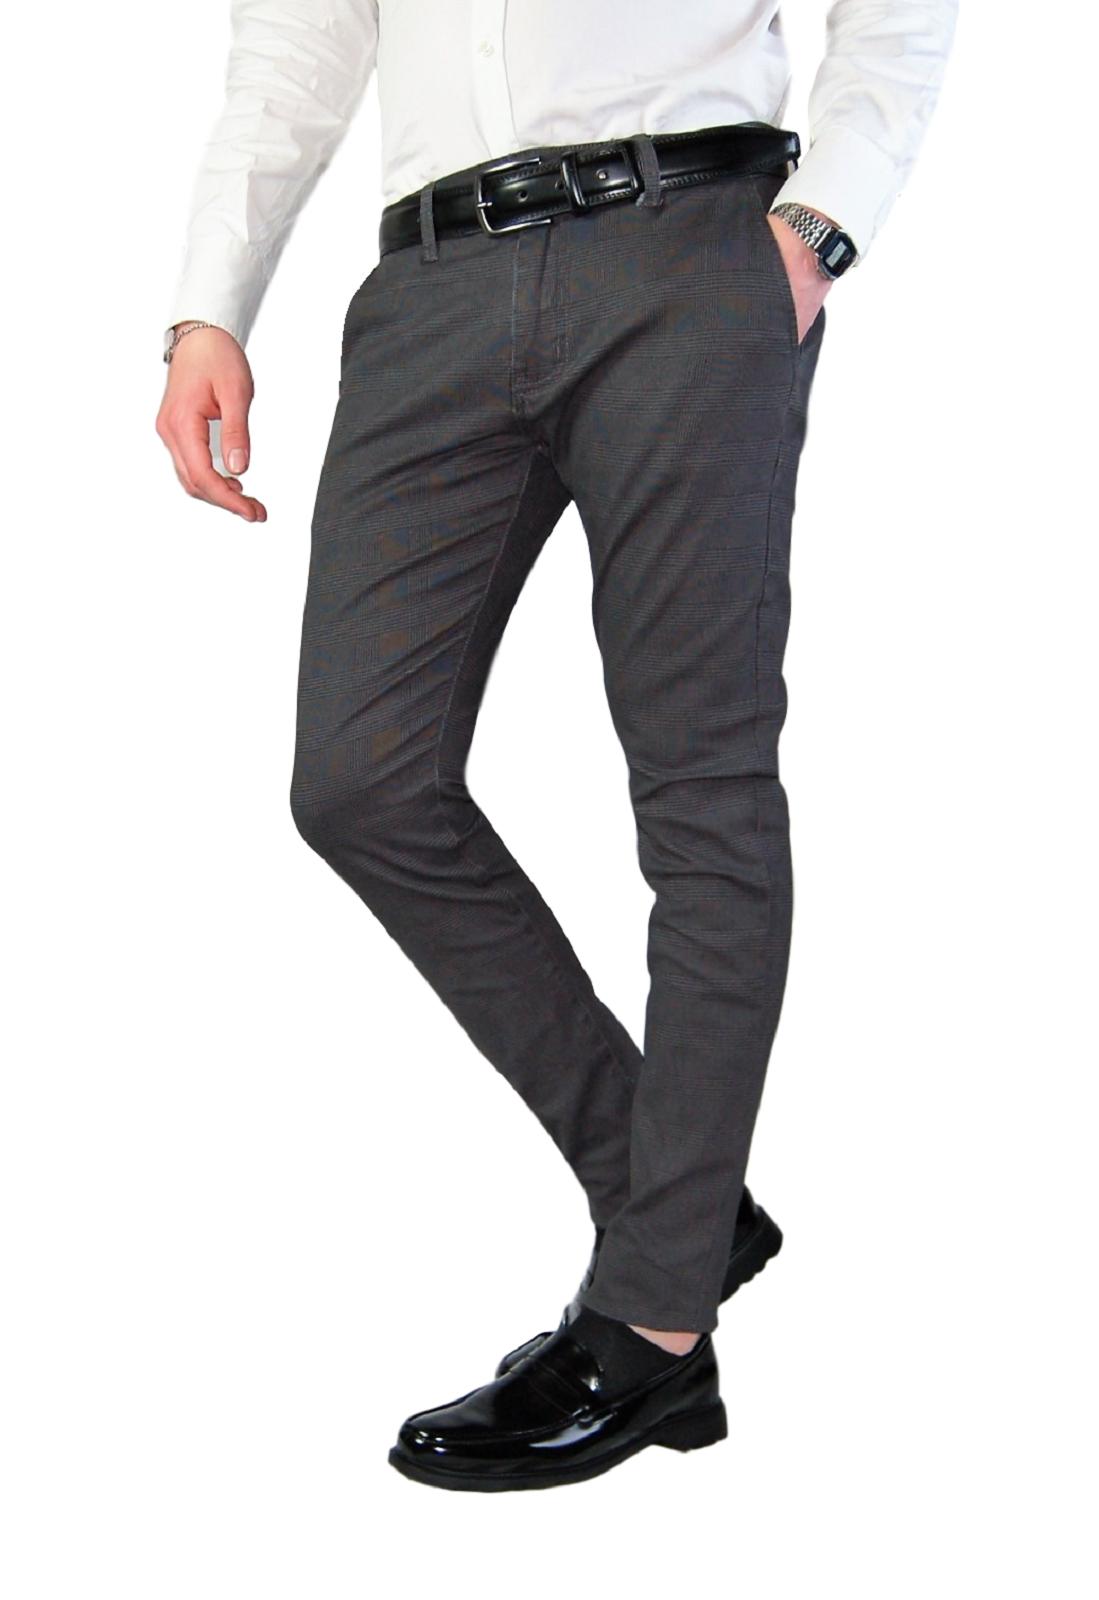 Pantalone-Uomo-Chino-Slim-Fit-Elegante-Quadri-Principe-di-Galles-Invernale miniatura 13